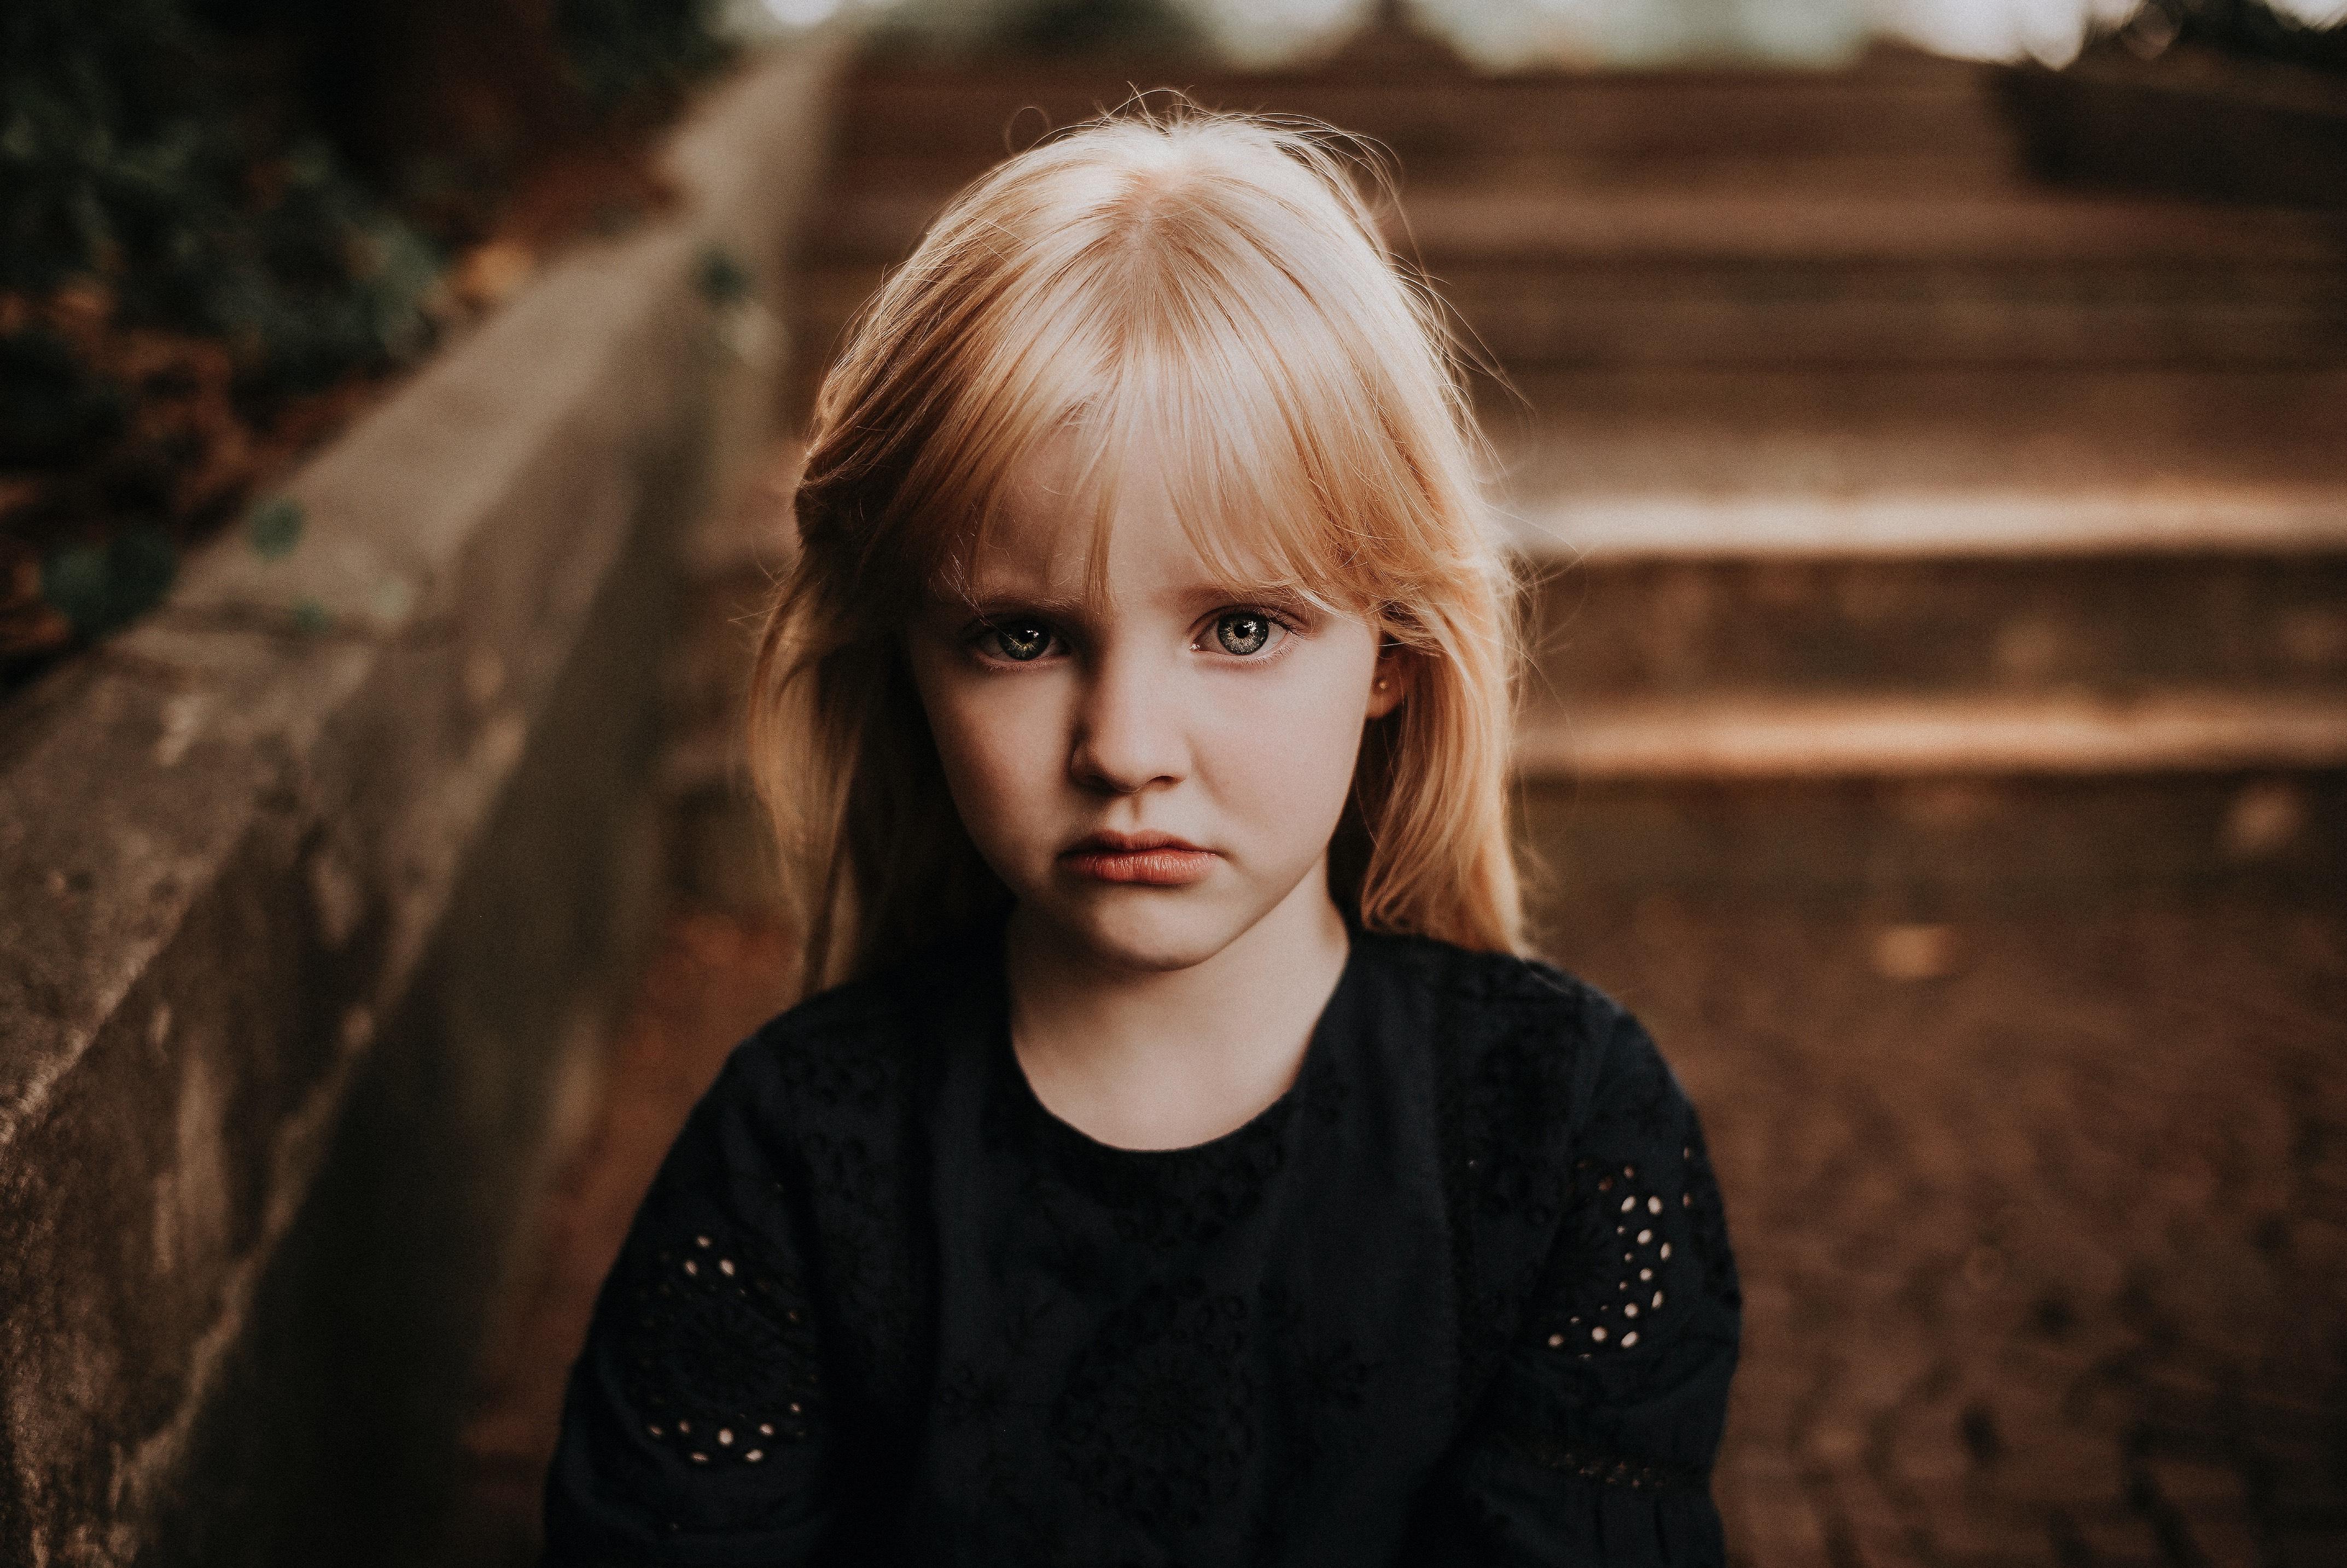 Little blonde girl looking sad